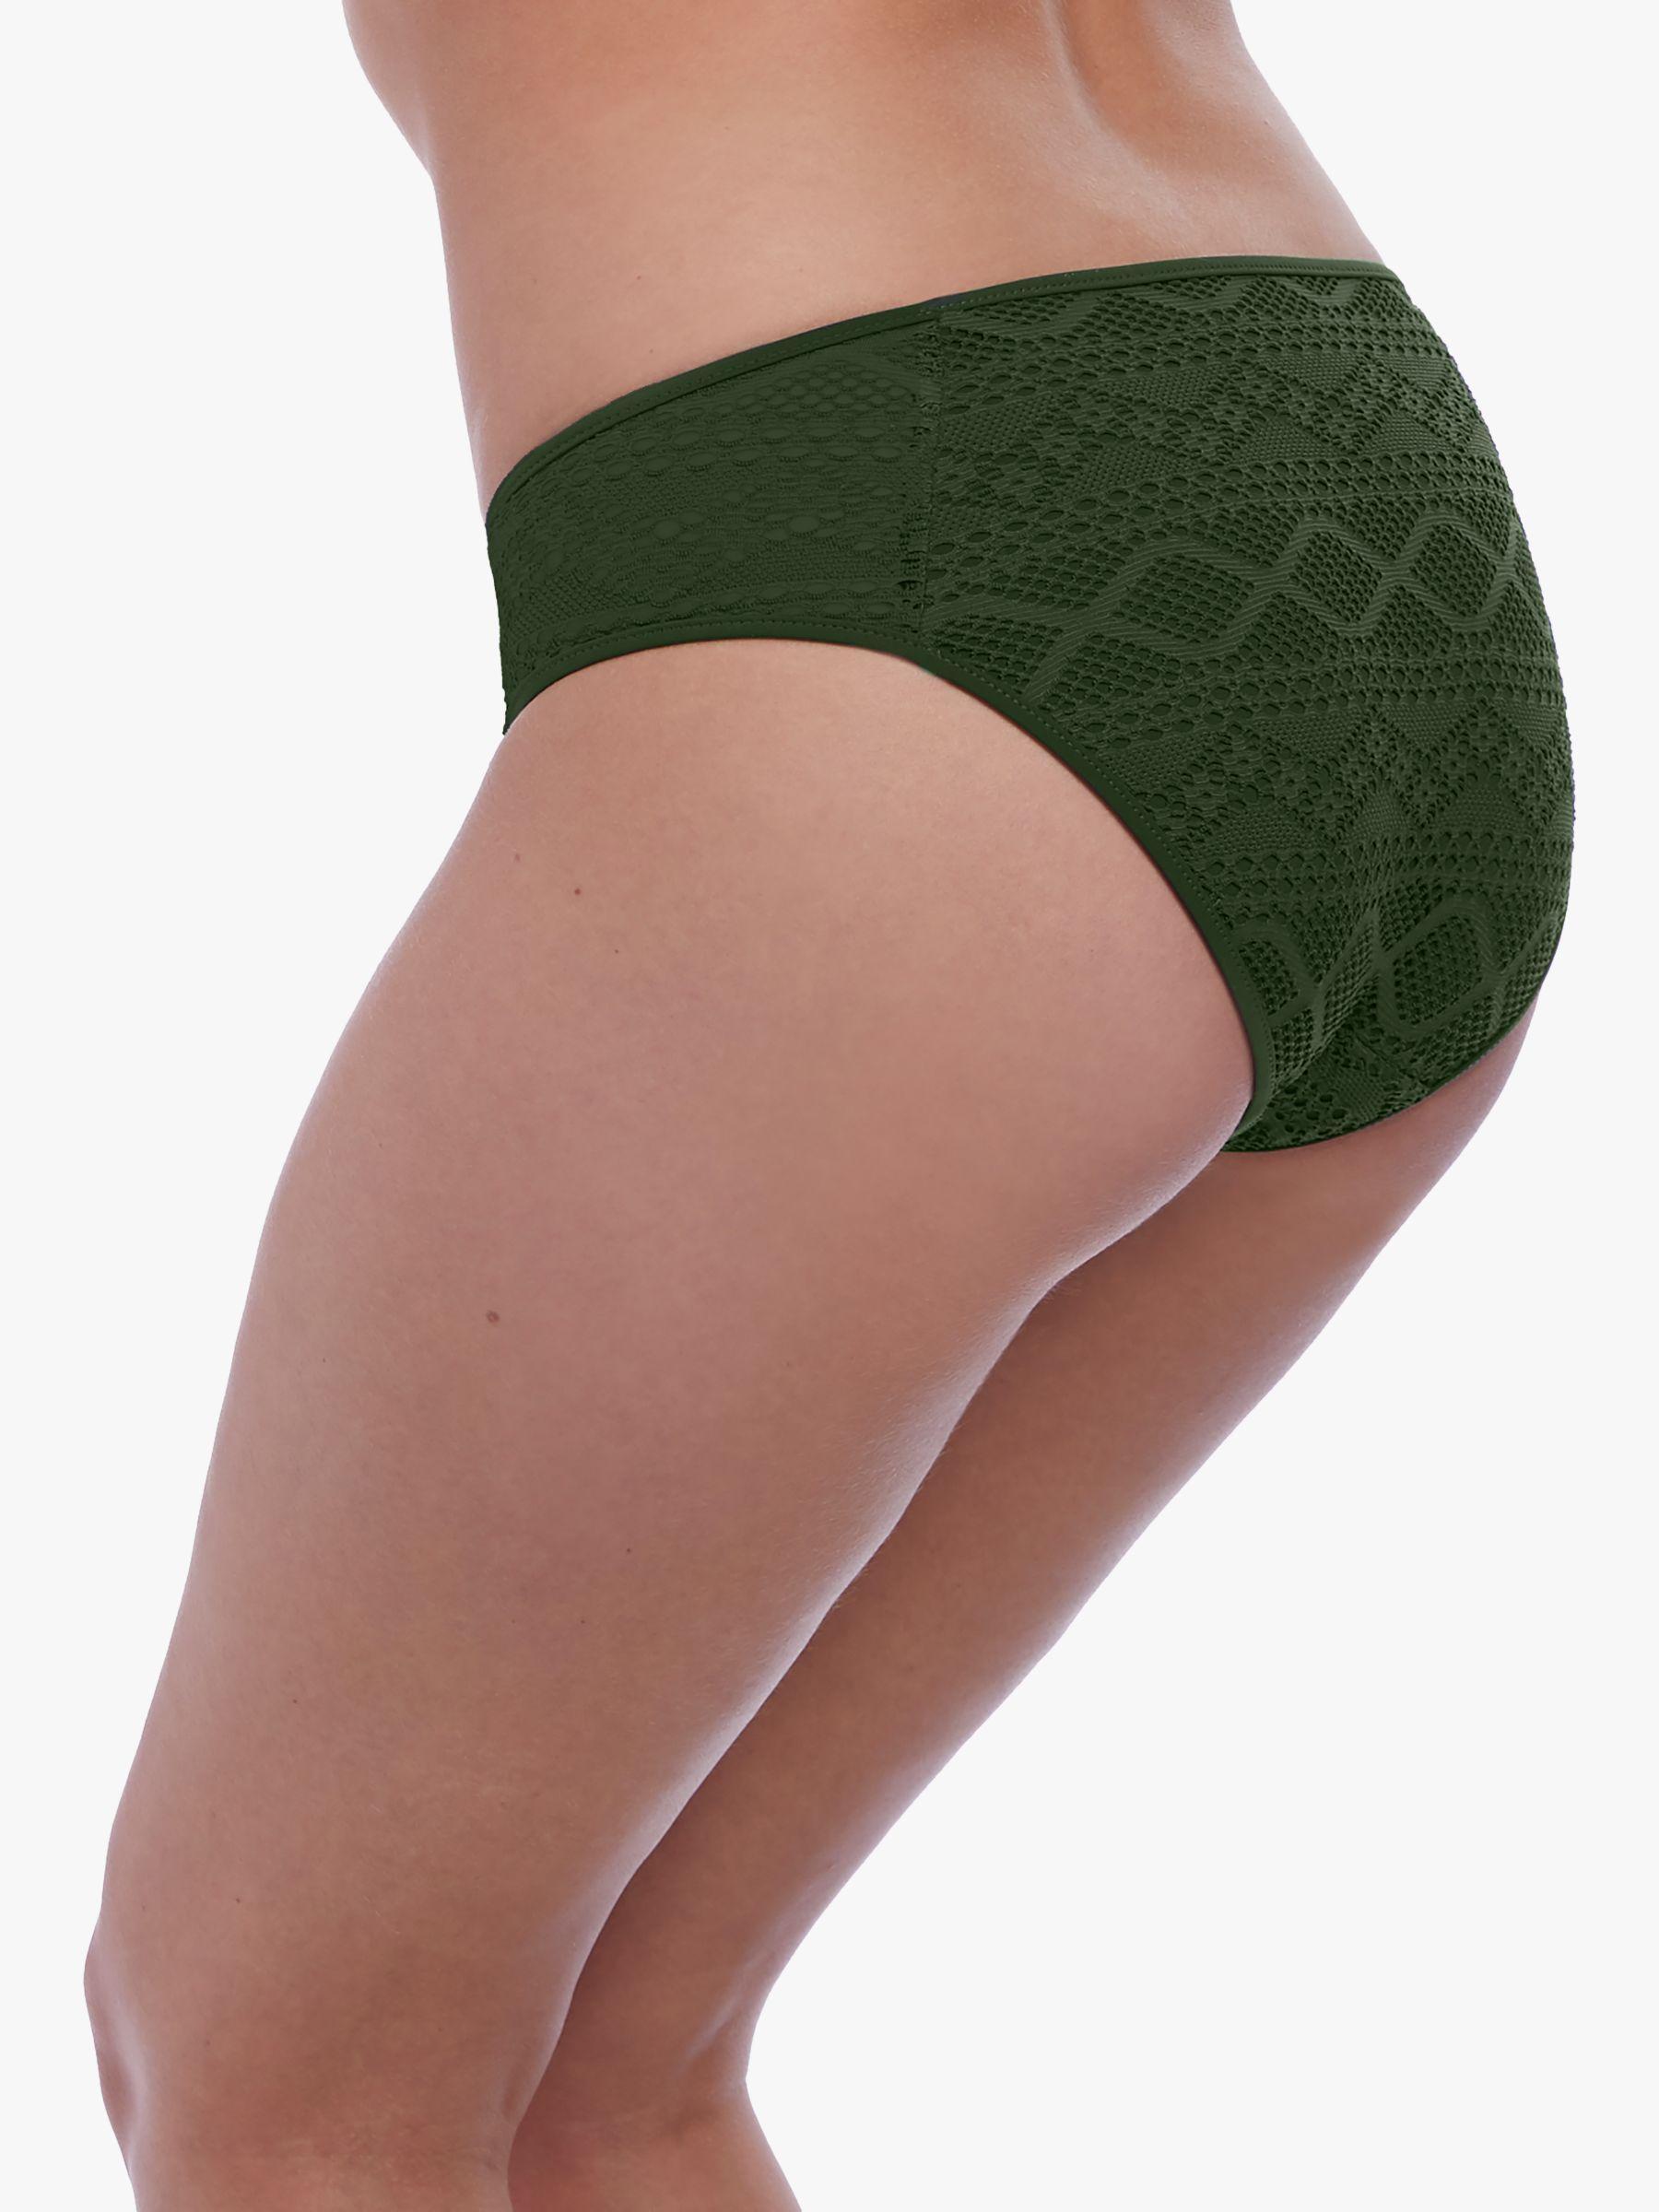 e741a32fea ... Sundance Hipster Bikini Bottoms - Lyst. View fullscreen